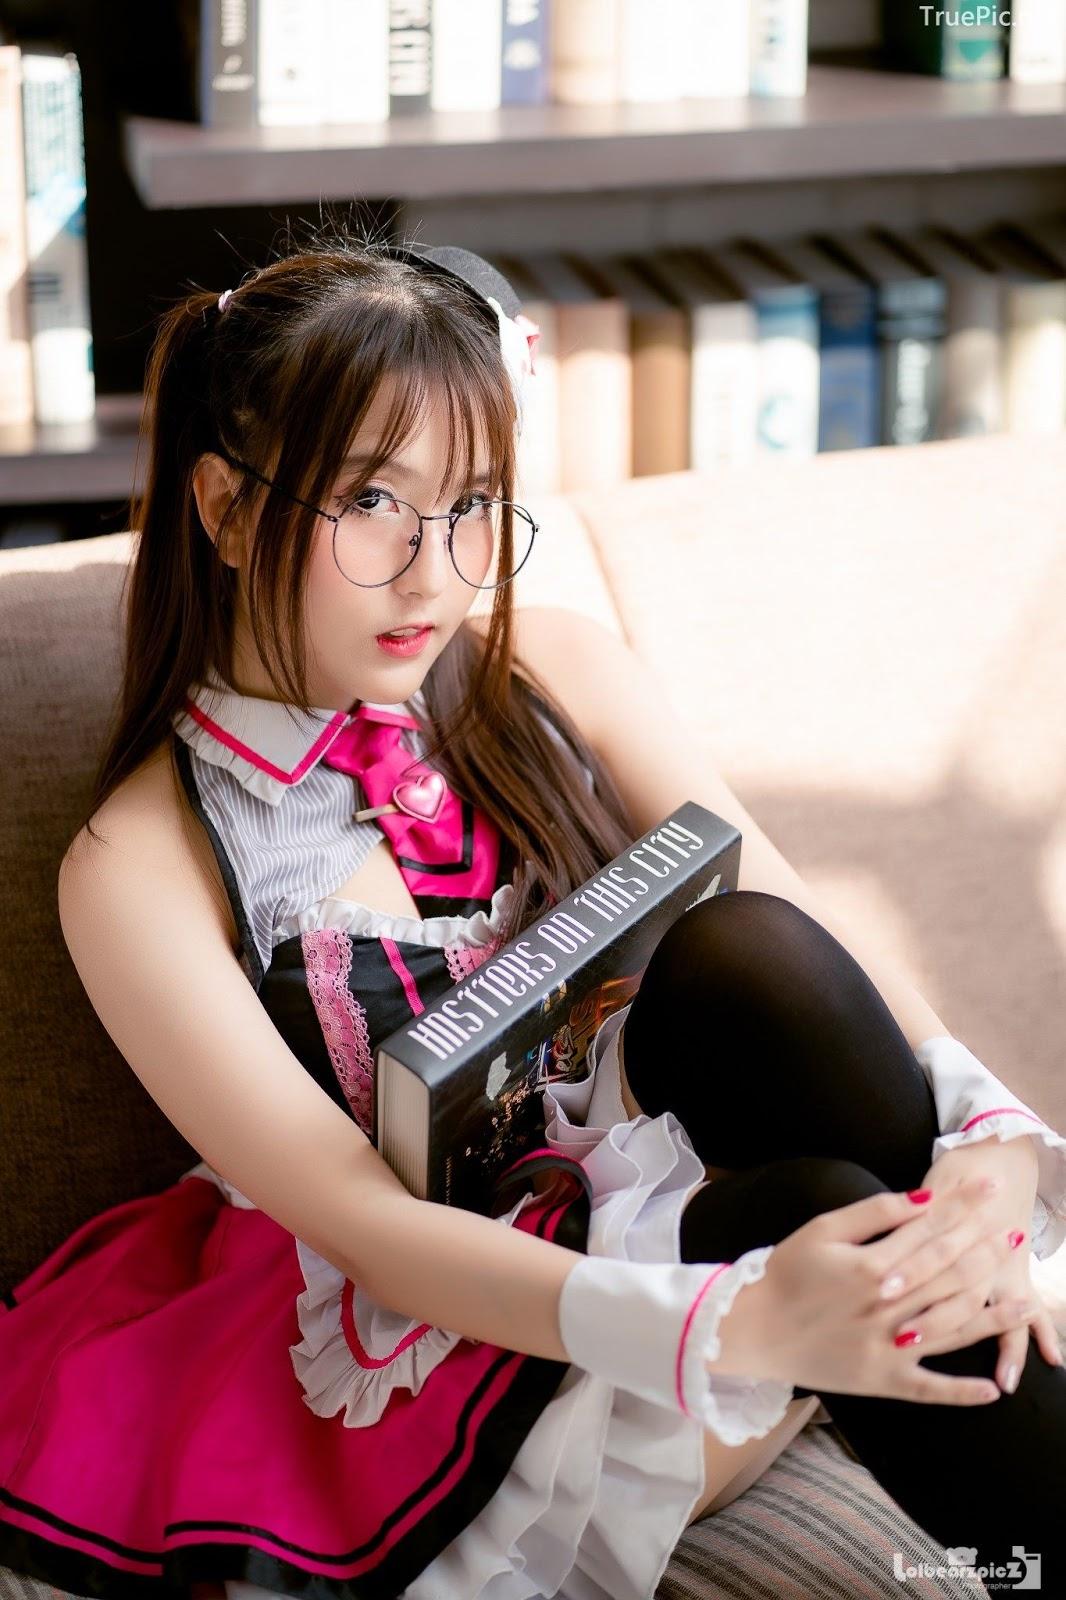 Thailand-Model-Phunnita-Intarapimai-Cute-Witch-Girl-TruePic.net- Picture-5